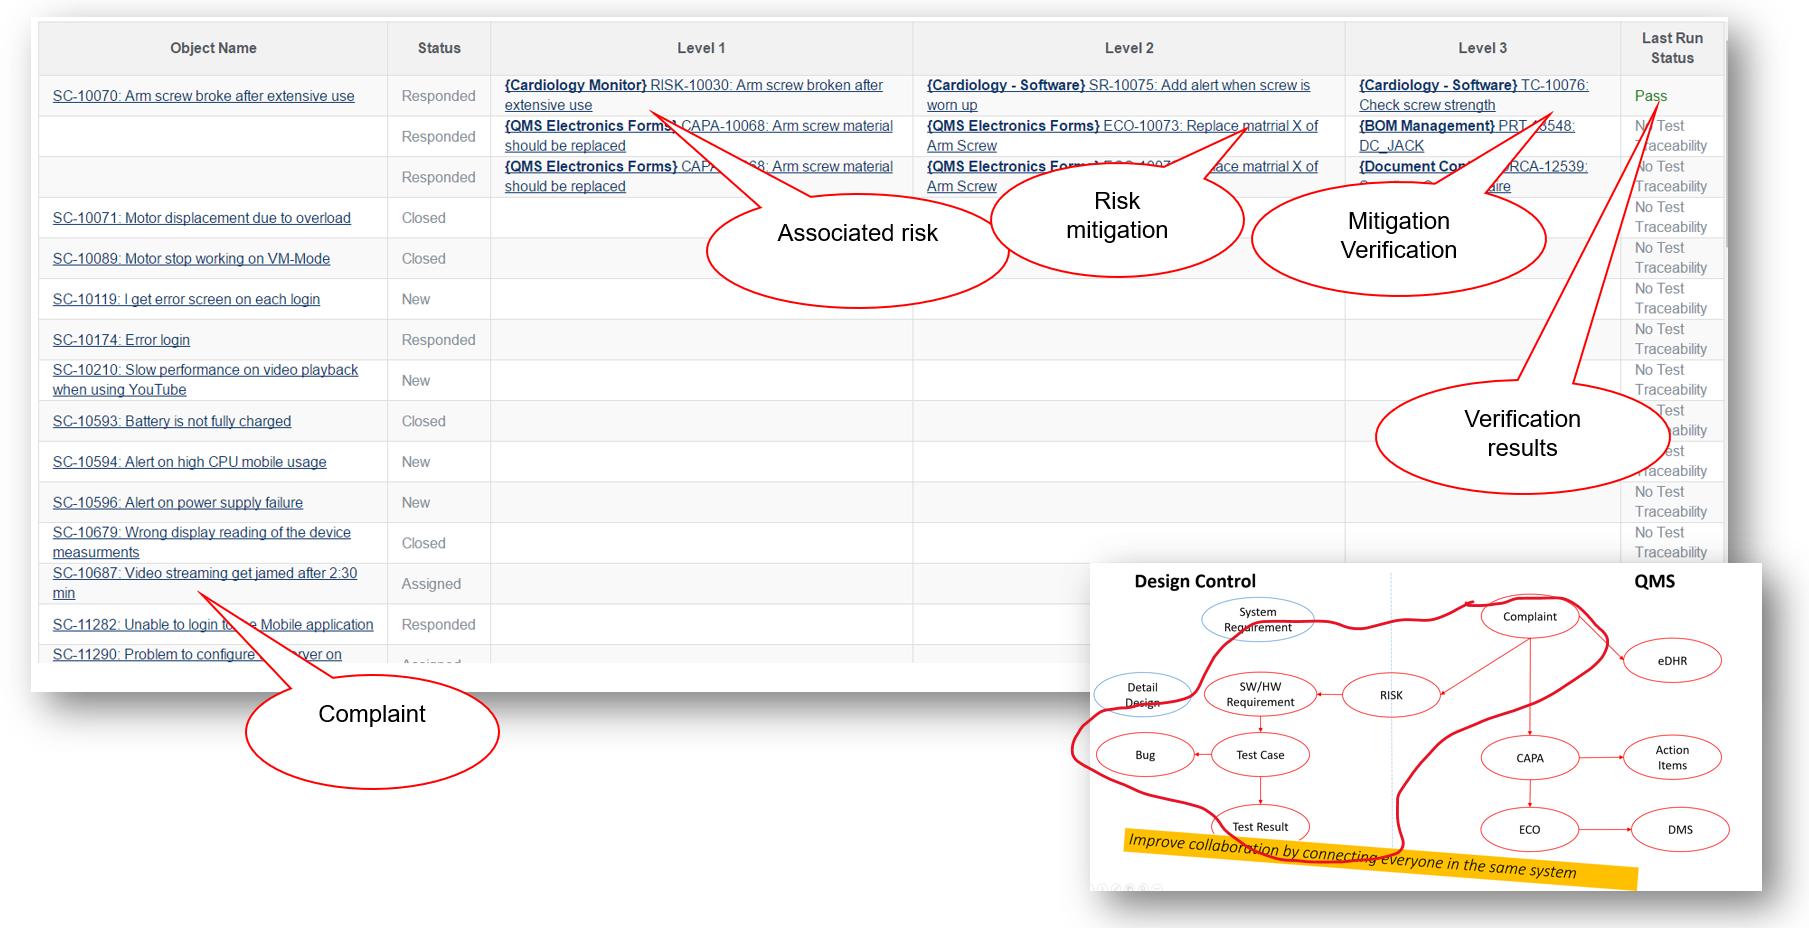 Orcanos SDLC full traceability matrix